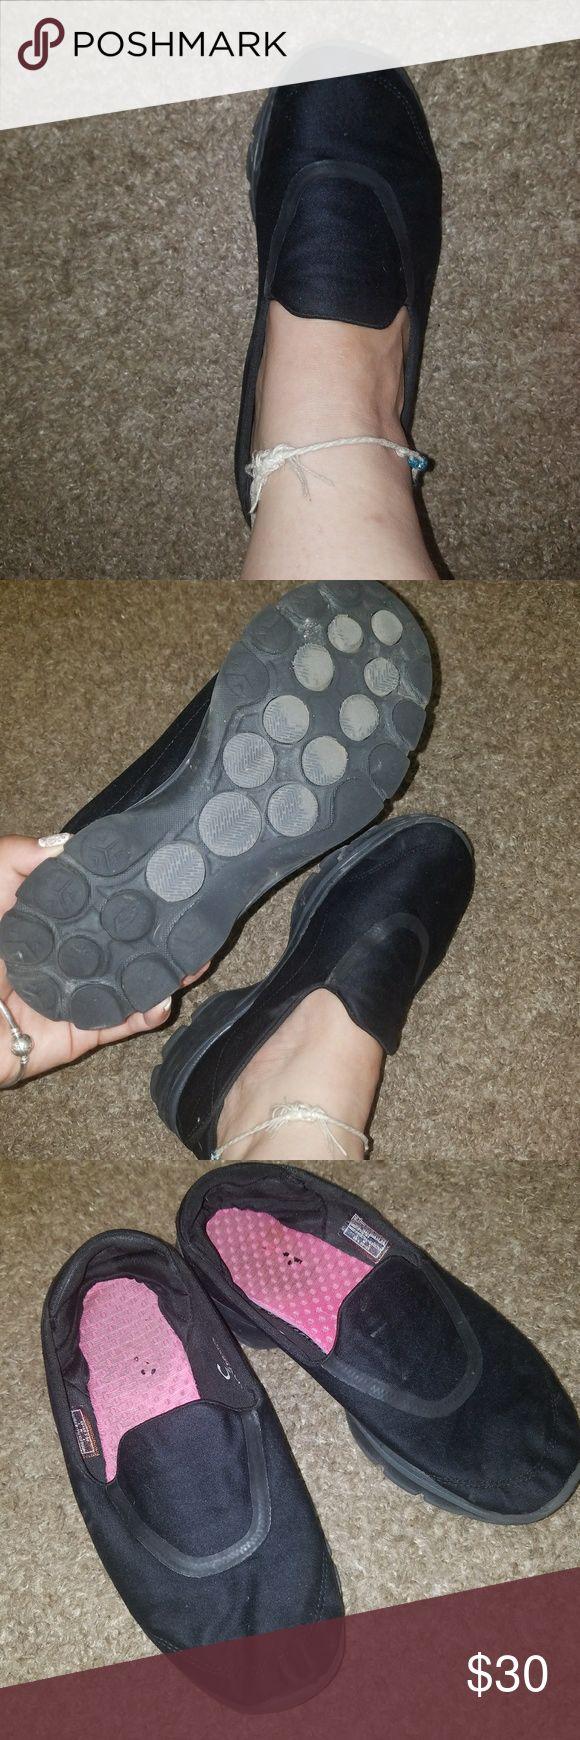 Sketchers go walk 3 Sketchers go walk 3 black used condition Skechers Shoes